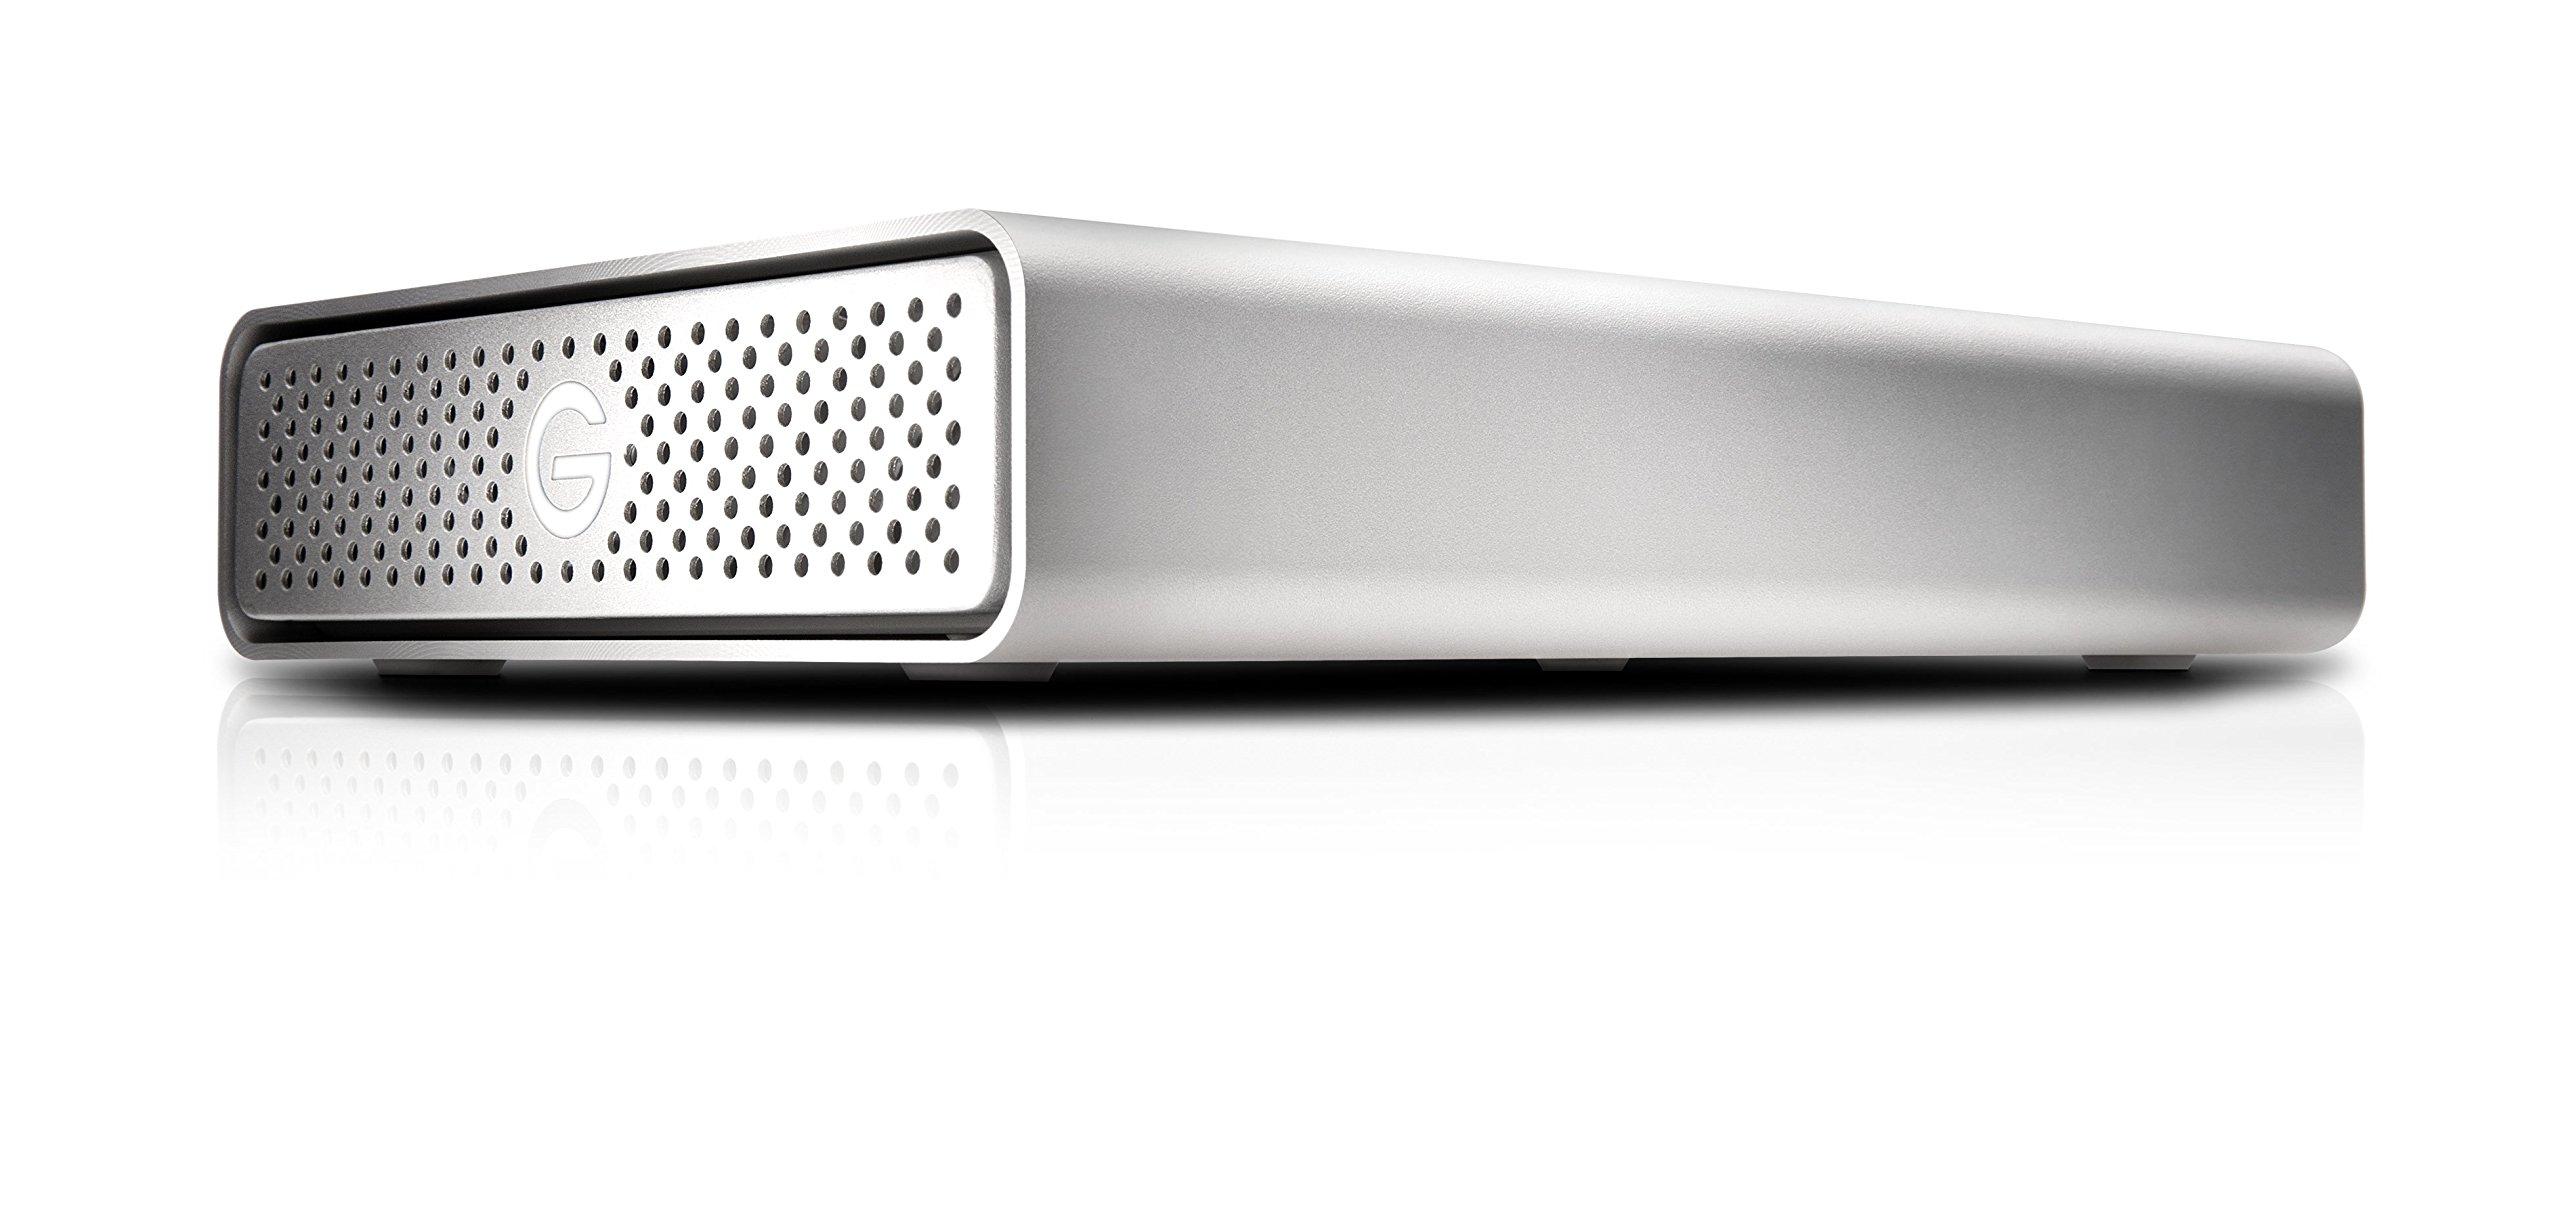 G-Technology G-DRIVE USB-C External Drive 4TB 0G05666 by G-Technology (Image #5)